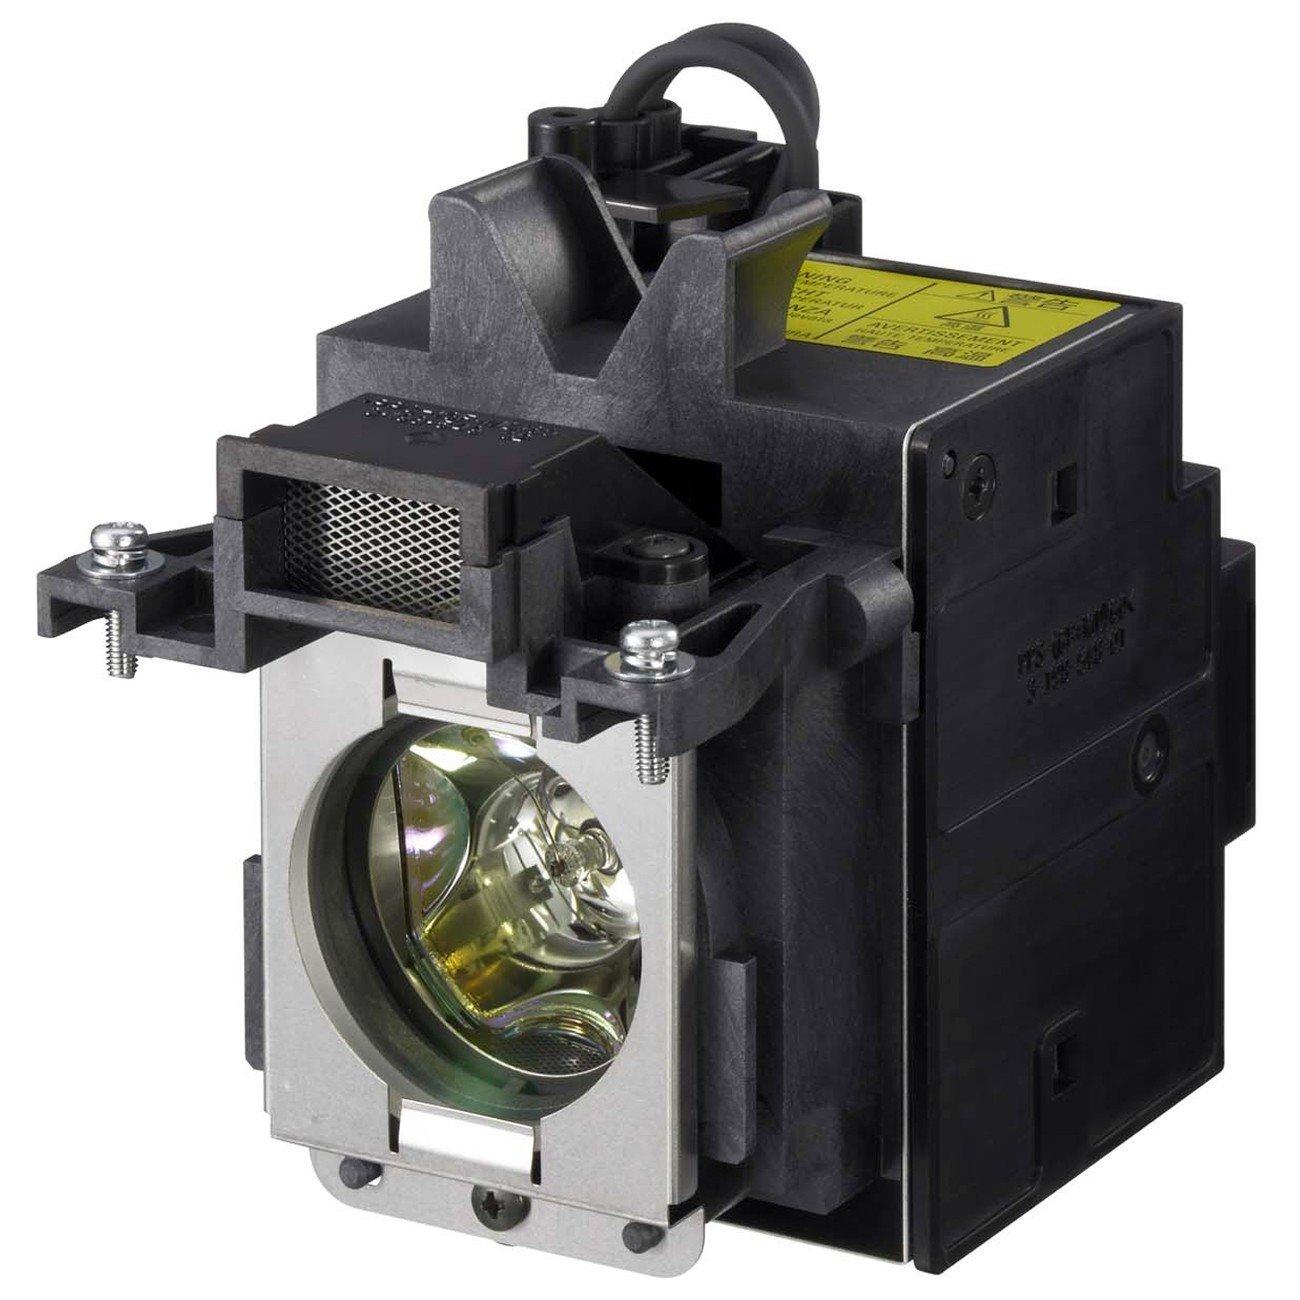 Sony LMP-C200 200 W Projector Lamp